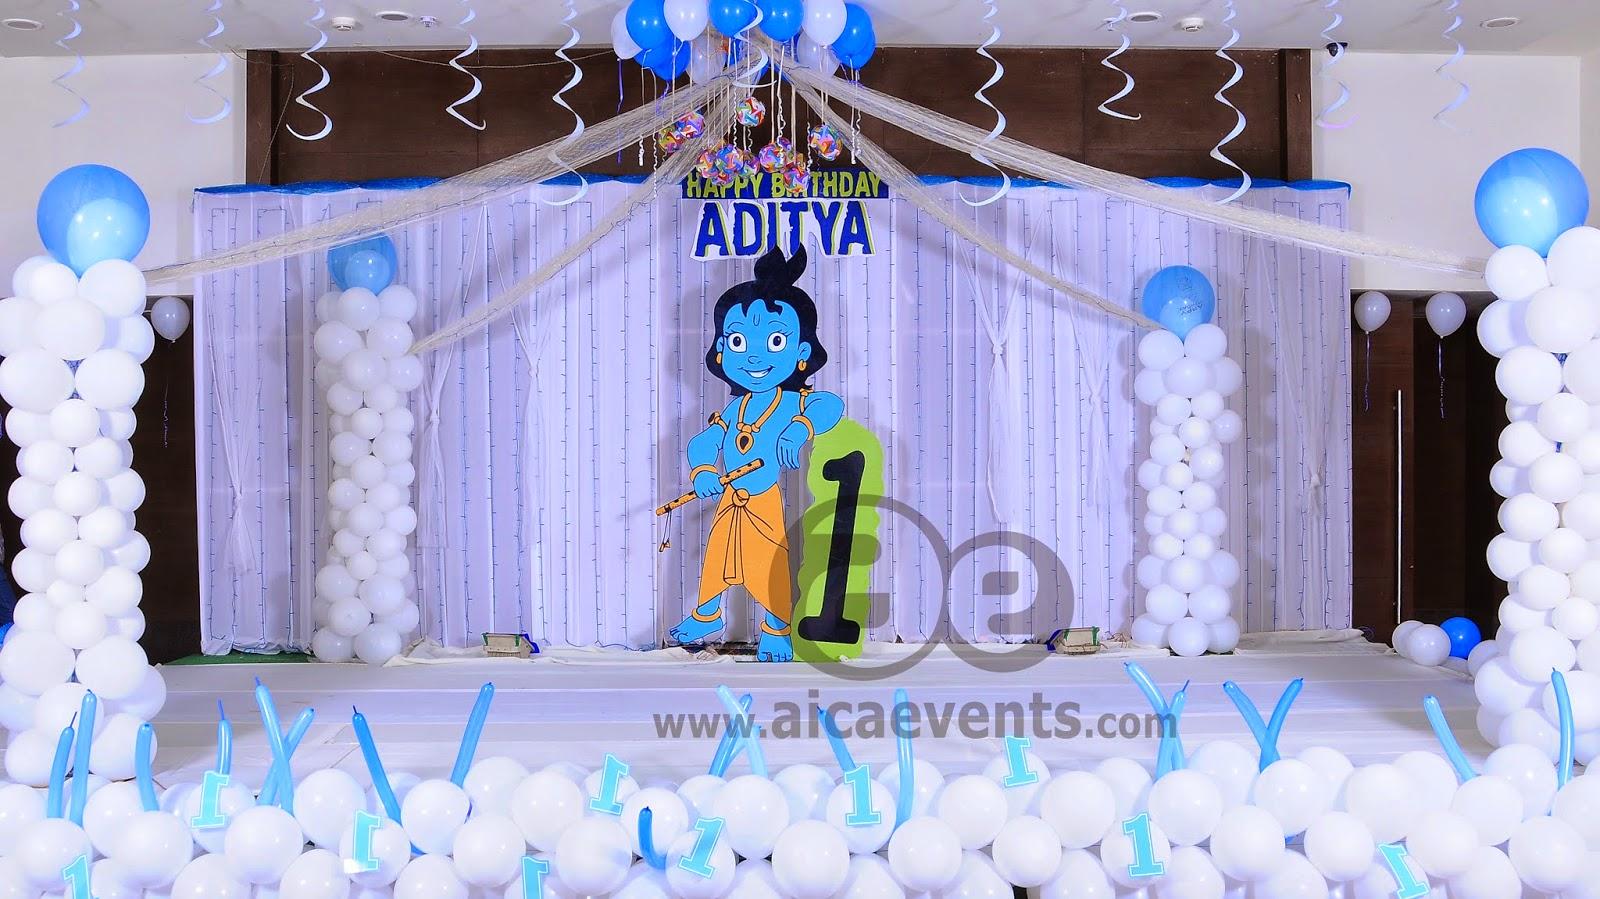 Aicaevents Krishna Theme Birthday Party Decorations